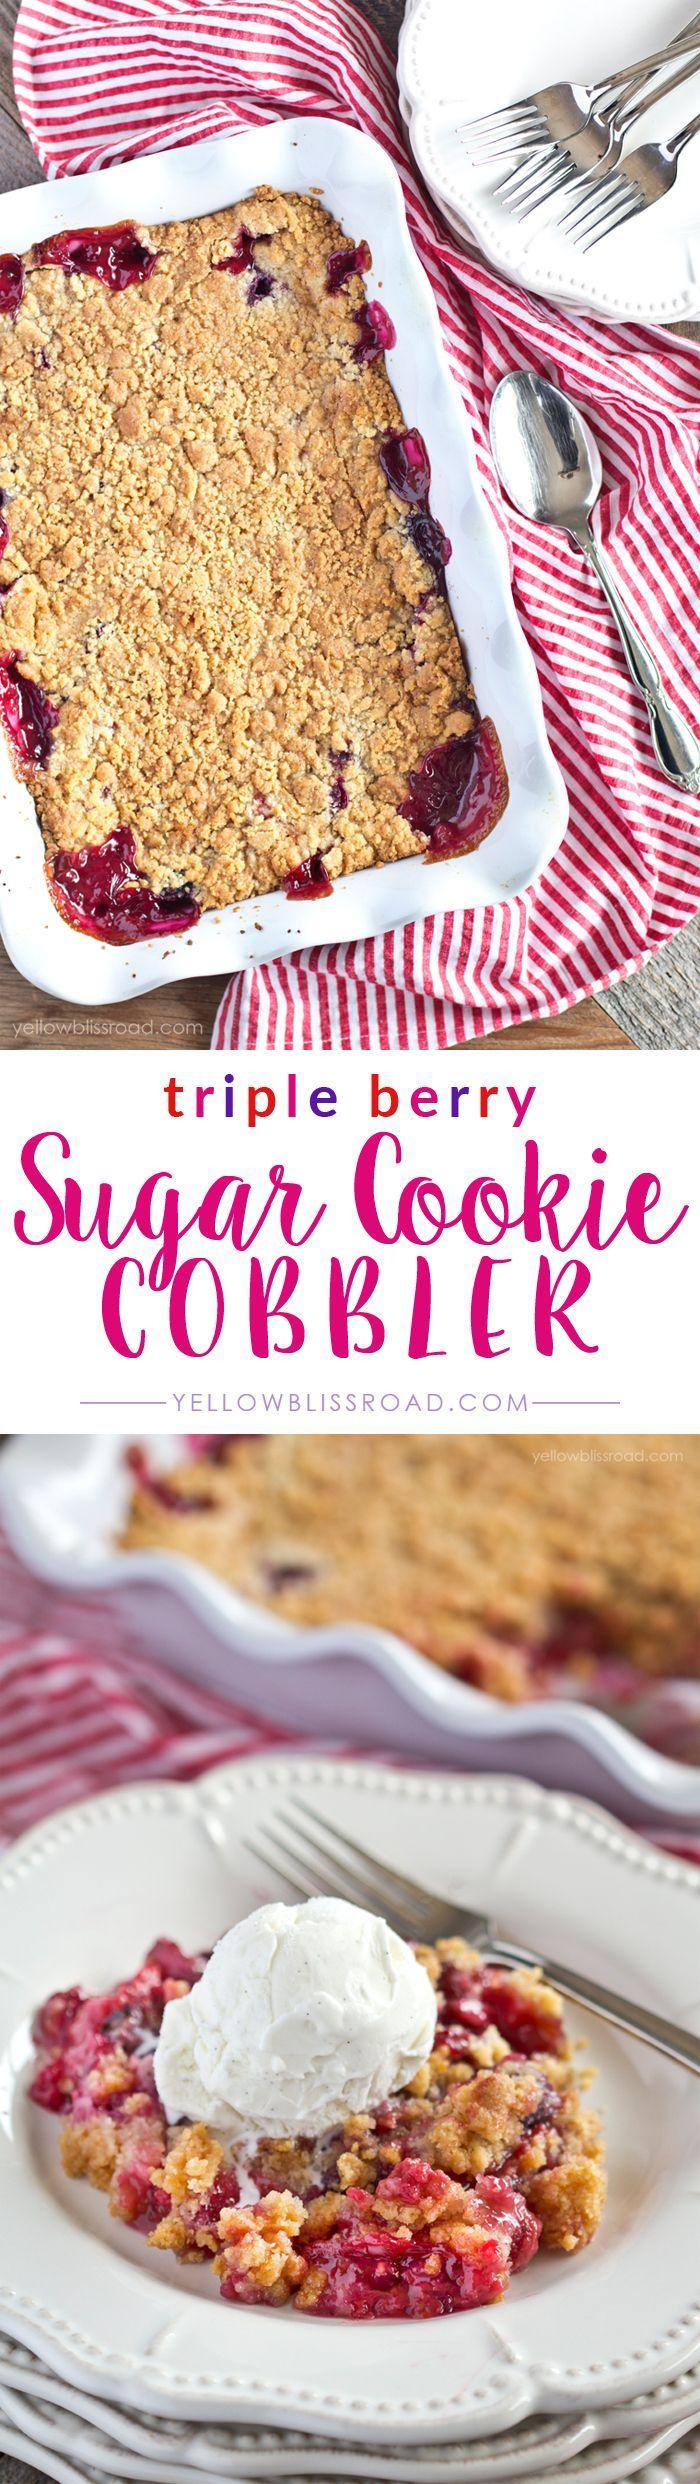 Triple Berry Sugar Cookie Cobbler with strawberries, blueberries and raspberries